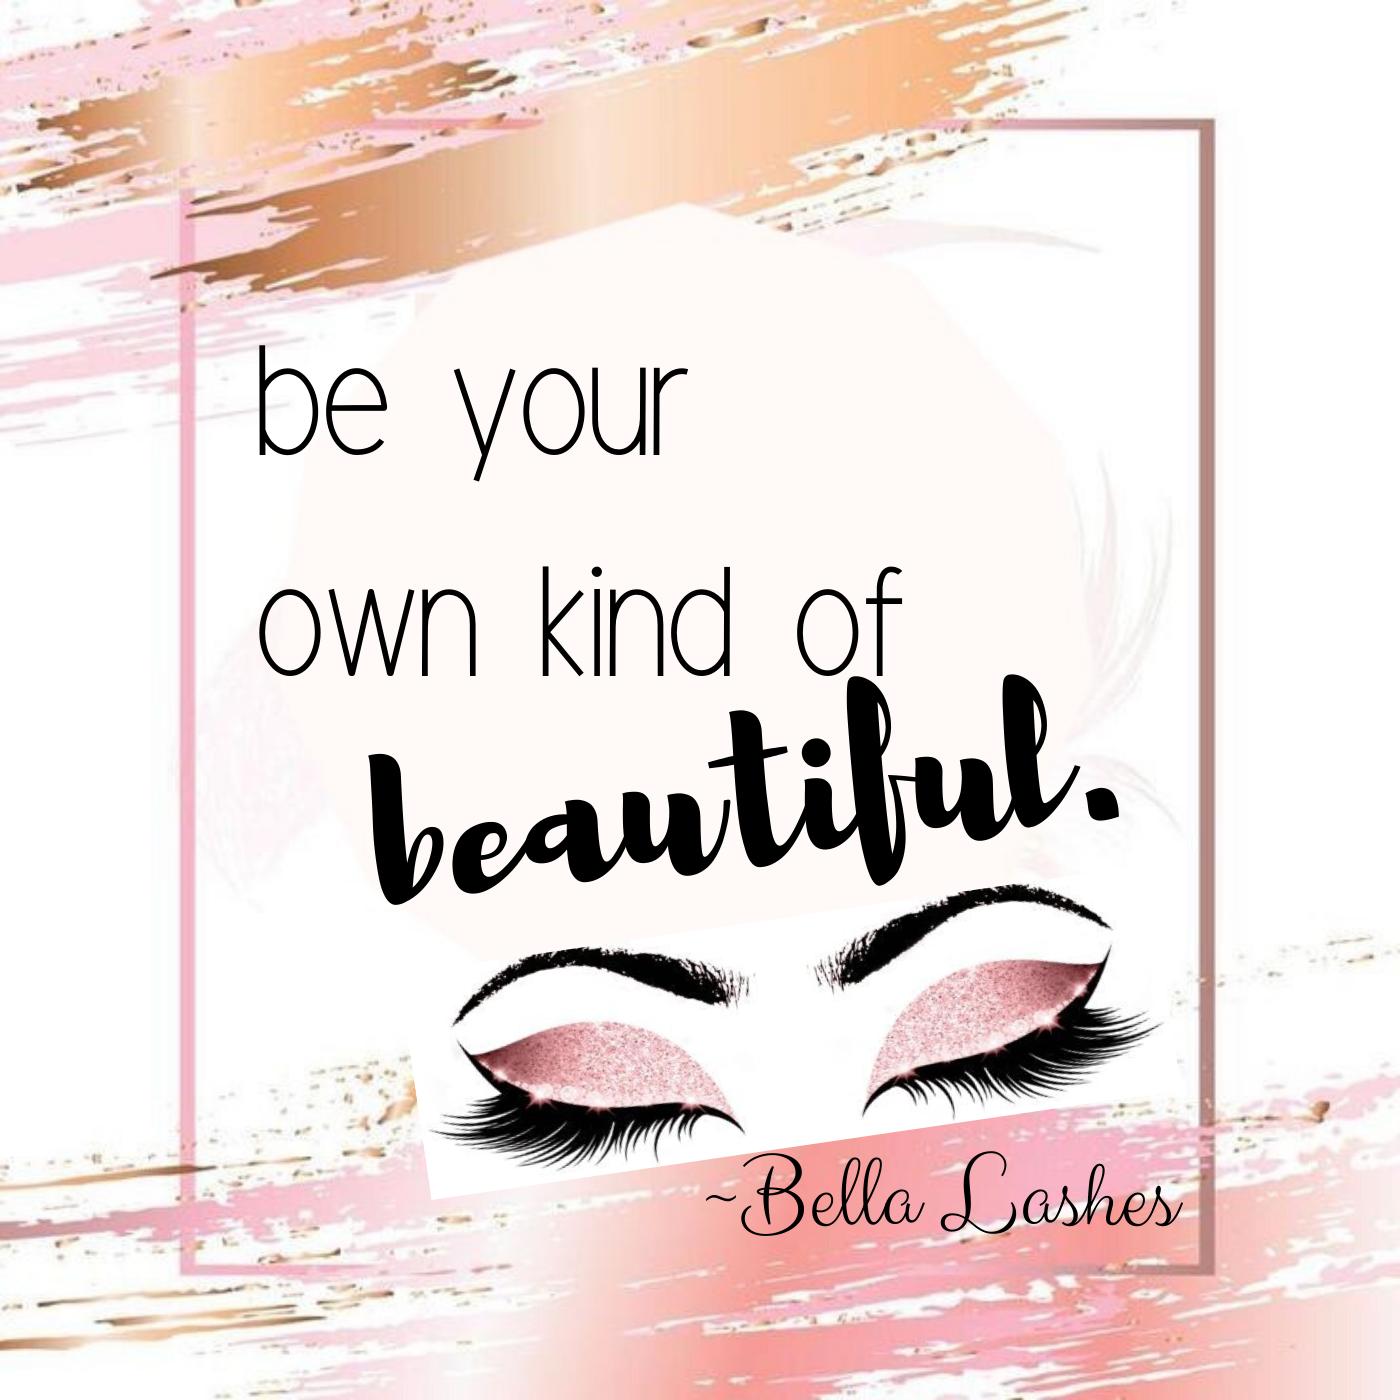 You are uniquely you. Own it 👑 . . . #bellamodastudio #girlboss #breadwinningwomen #girlbosses #empowered #empower #femmpreneur #entrepreneur #womenentrepreneur #womensupportwomen #feminist #feminism #feministaf #shoponline #smallbiz #feministmovement #strongwomen #beautiful #beautyadvice #beautytricks #glowup #inspired #inspiredwomen #quote #quoteoftheday #inspiration #jadapinkettsmith #empoweredwomen